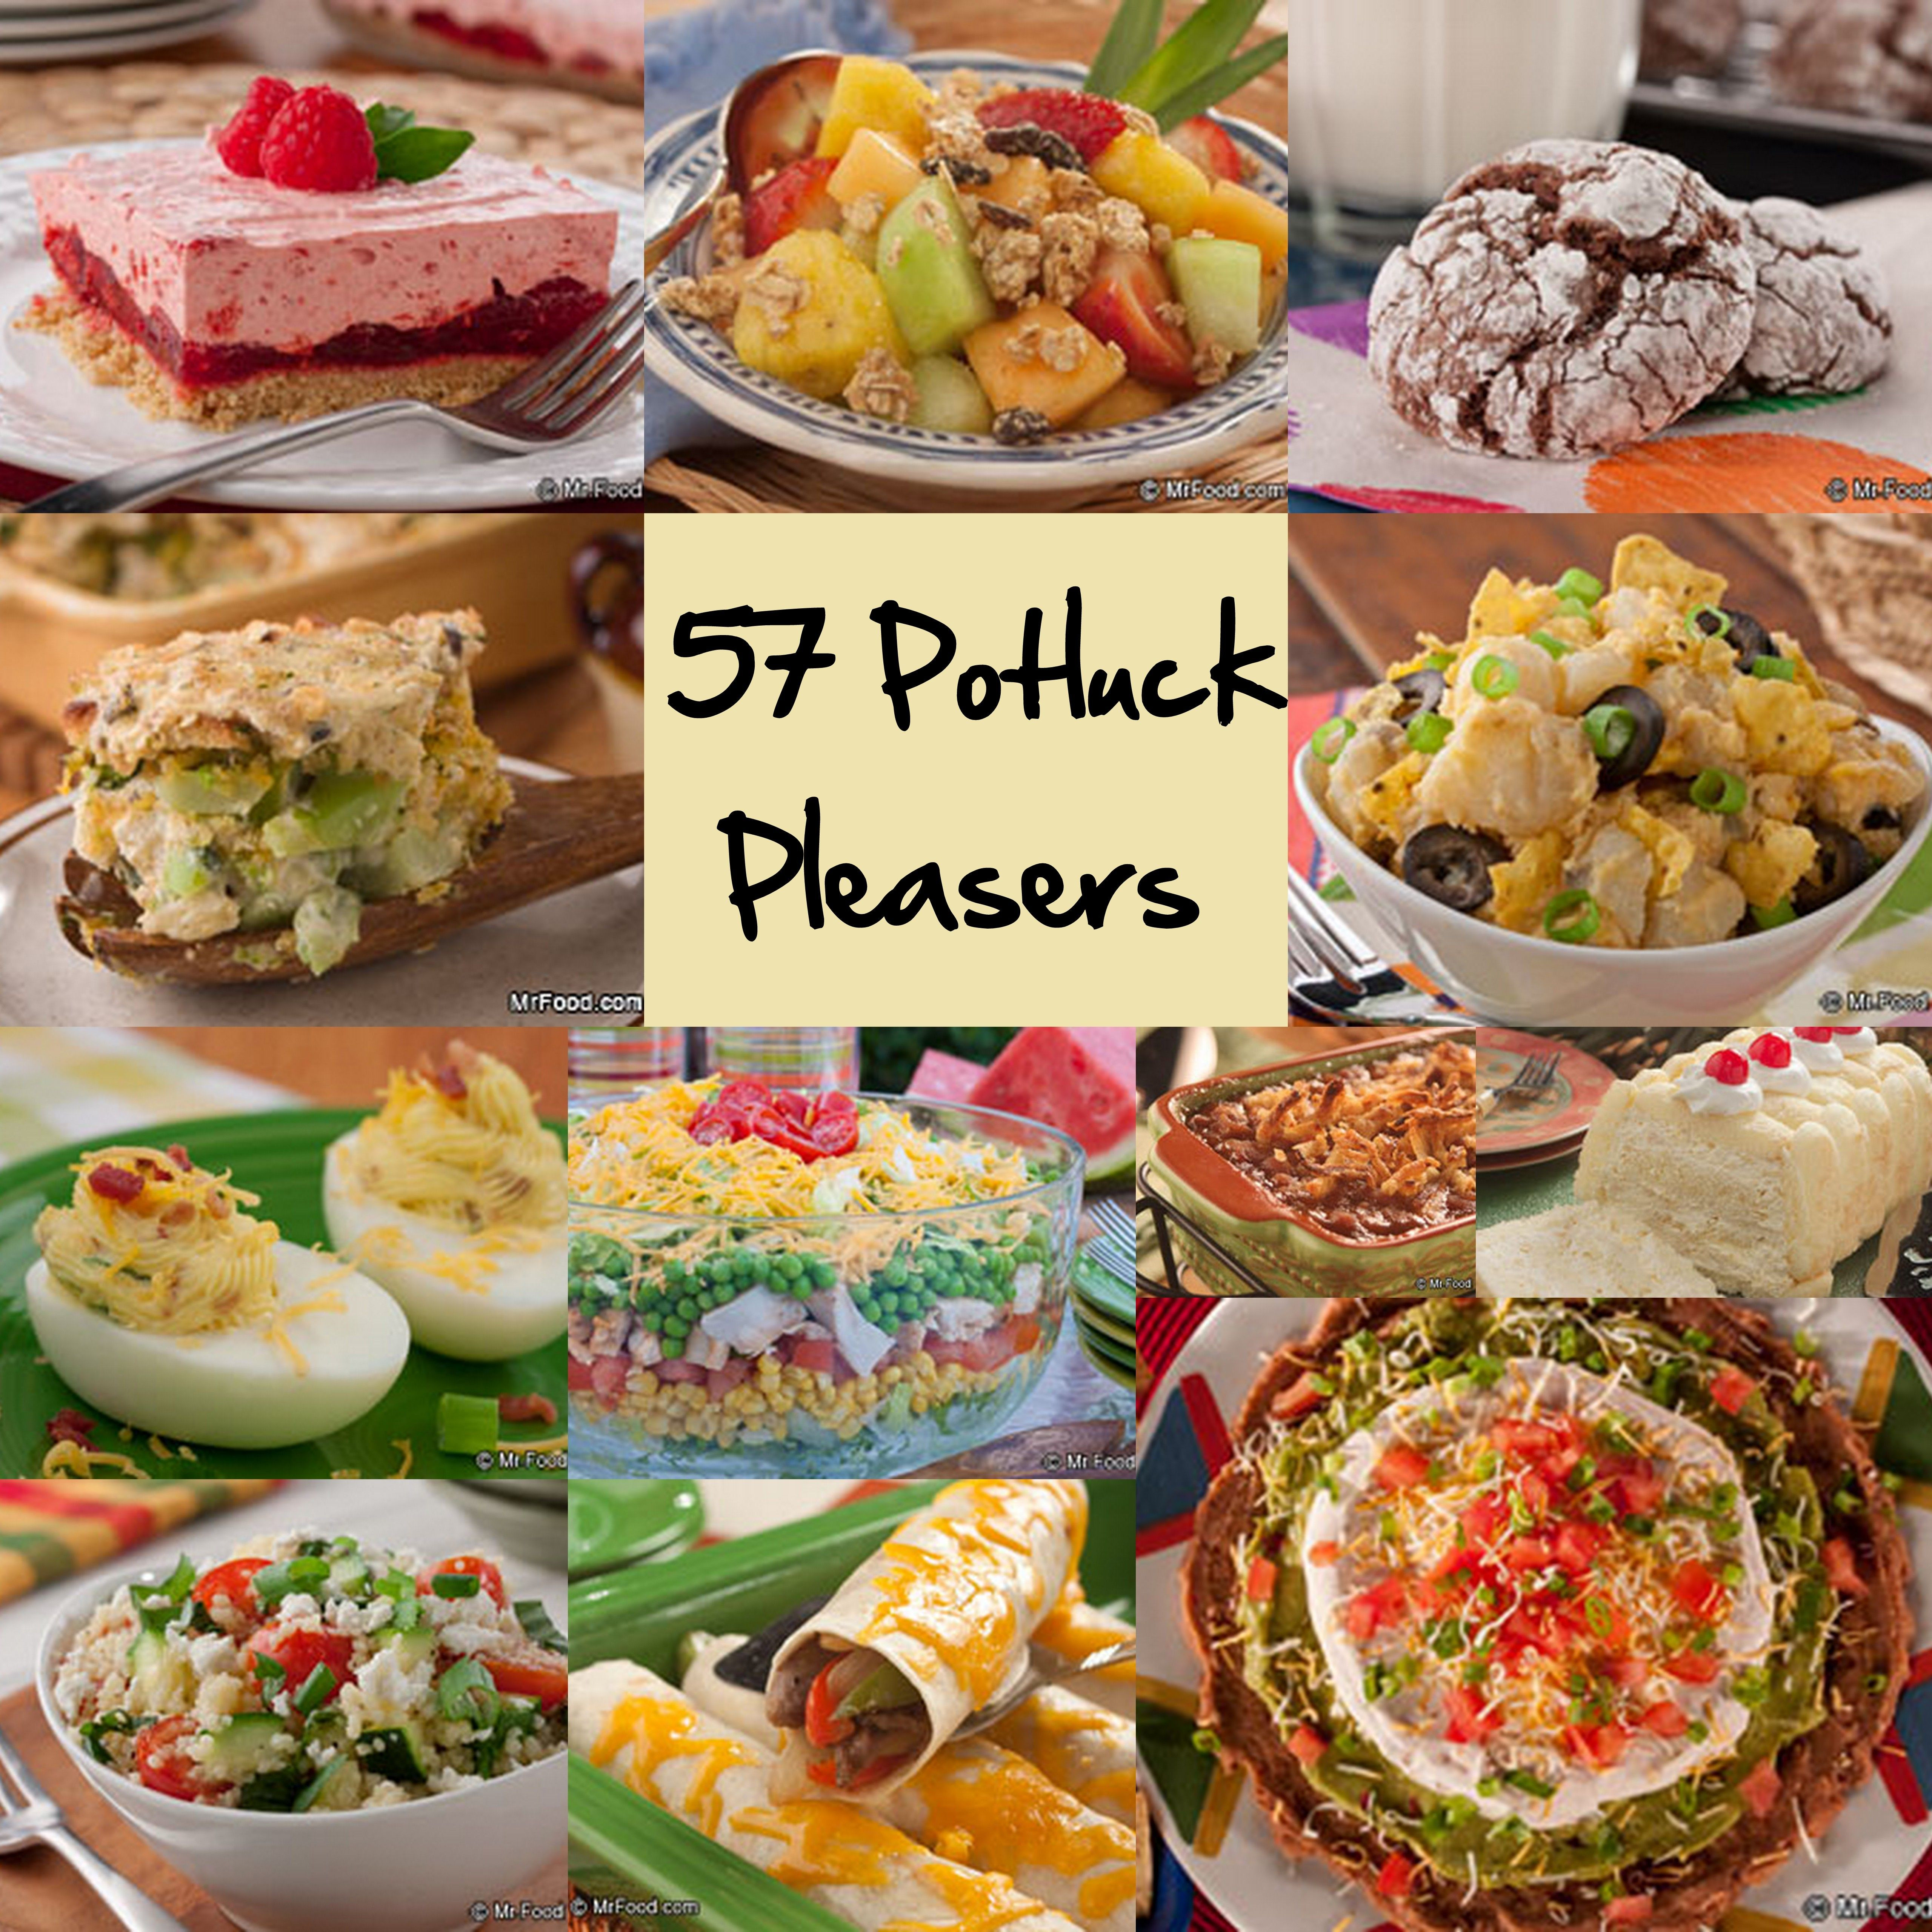 Easy Potluck Main Dishes  Easy Potluck Recipes 58 Potluck Ideas